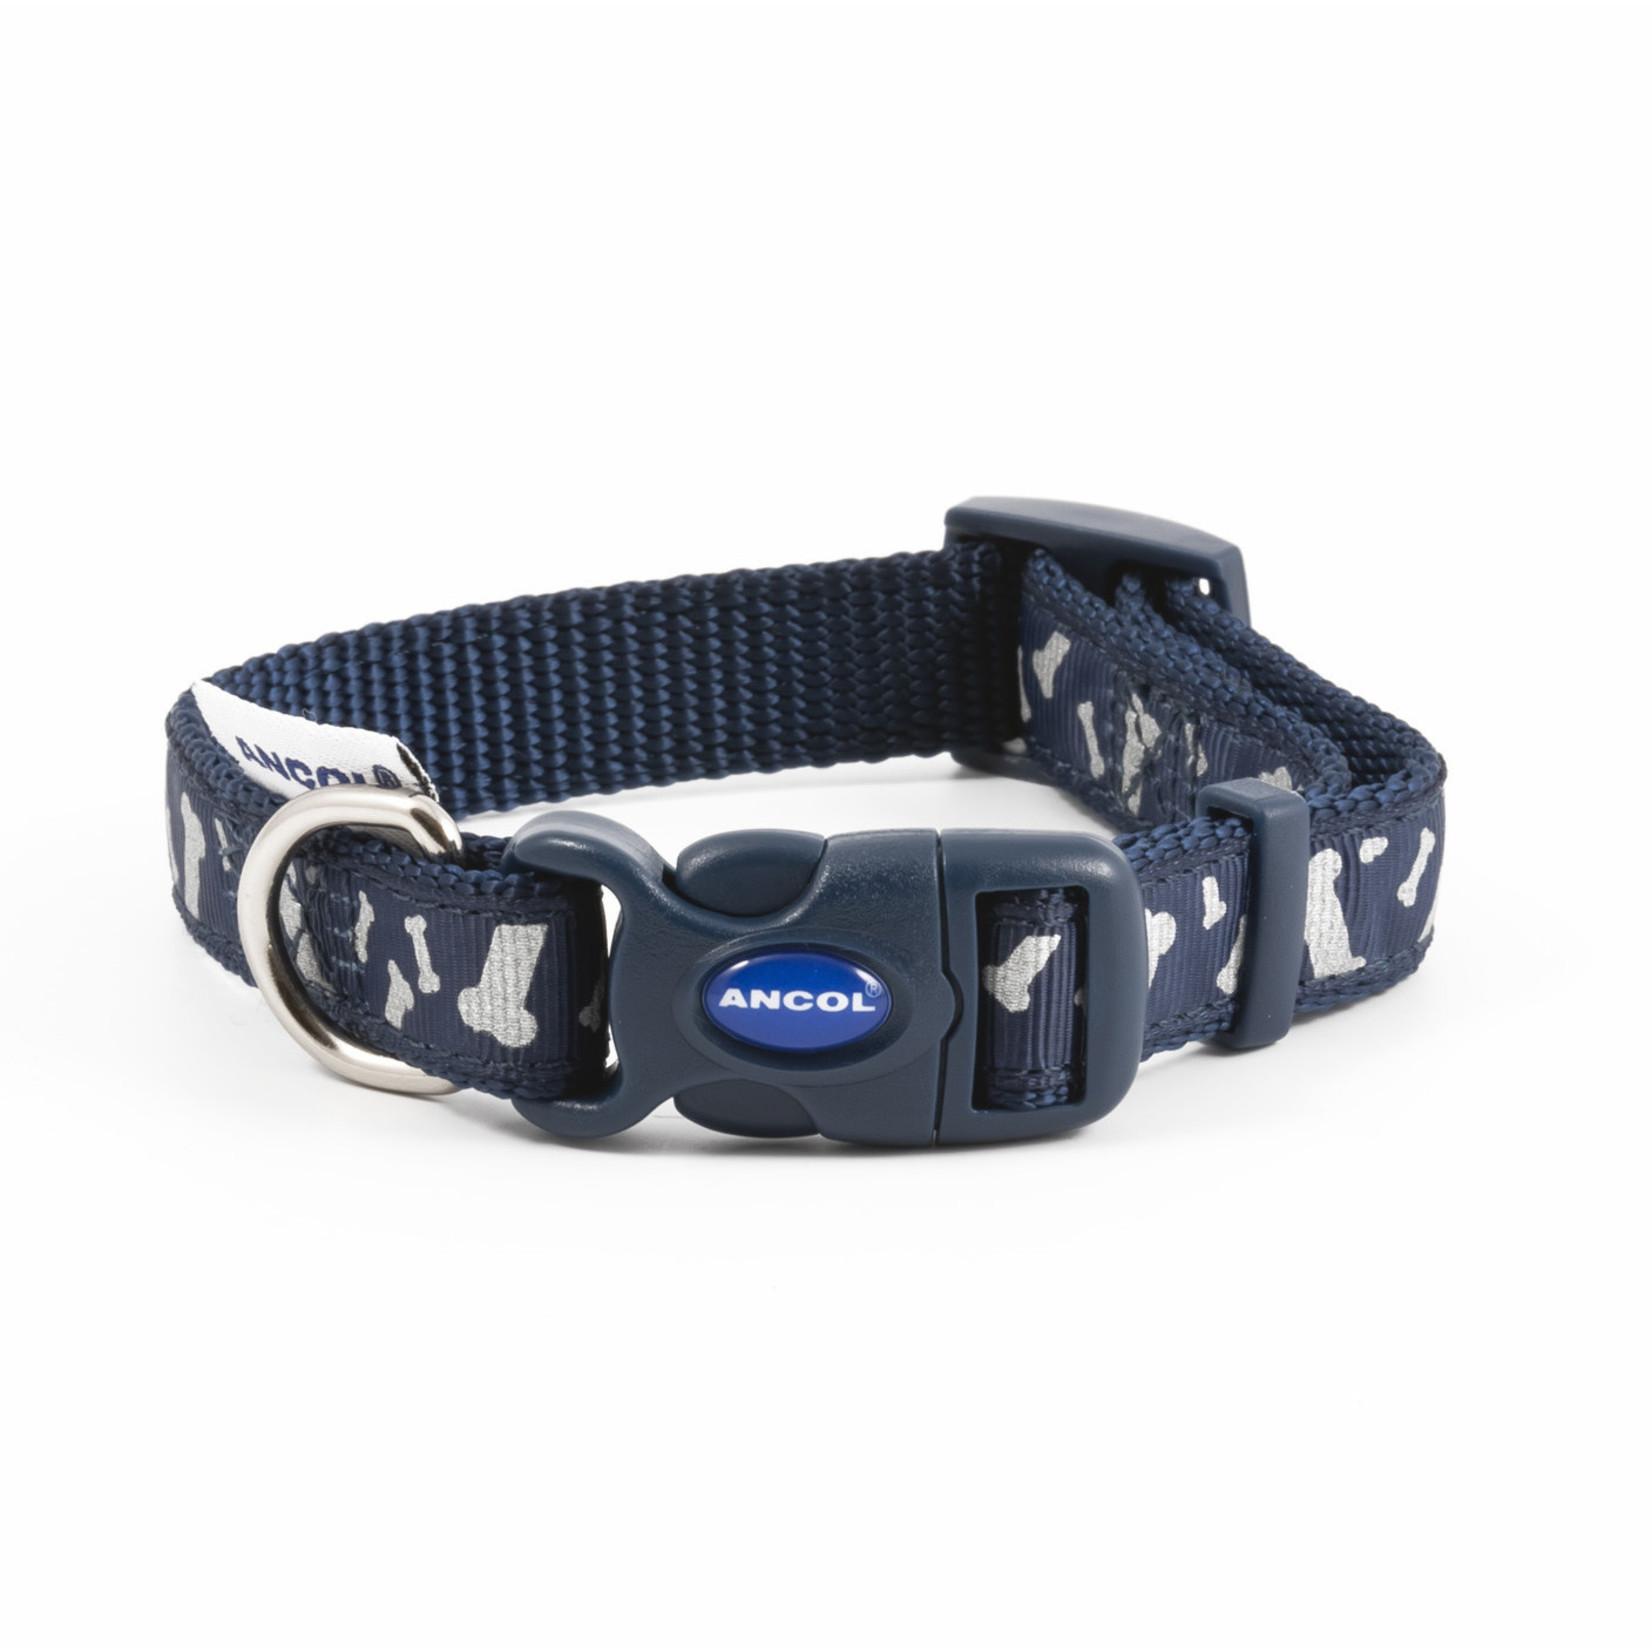 Ancol Adjustable Nylon Blue Bones Reflective Dog Collar